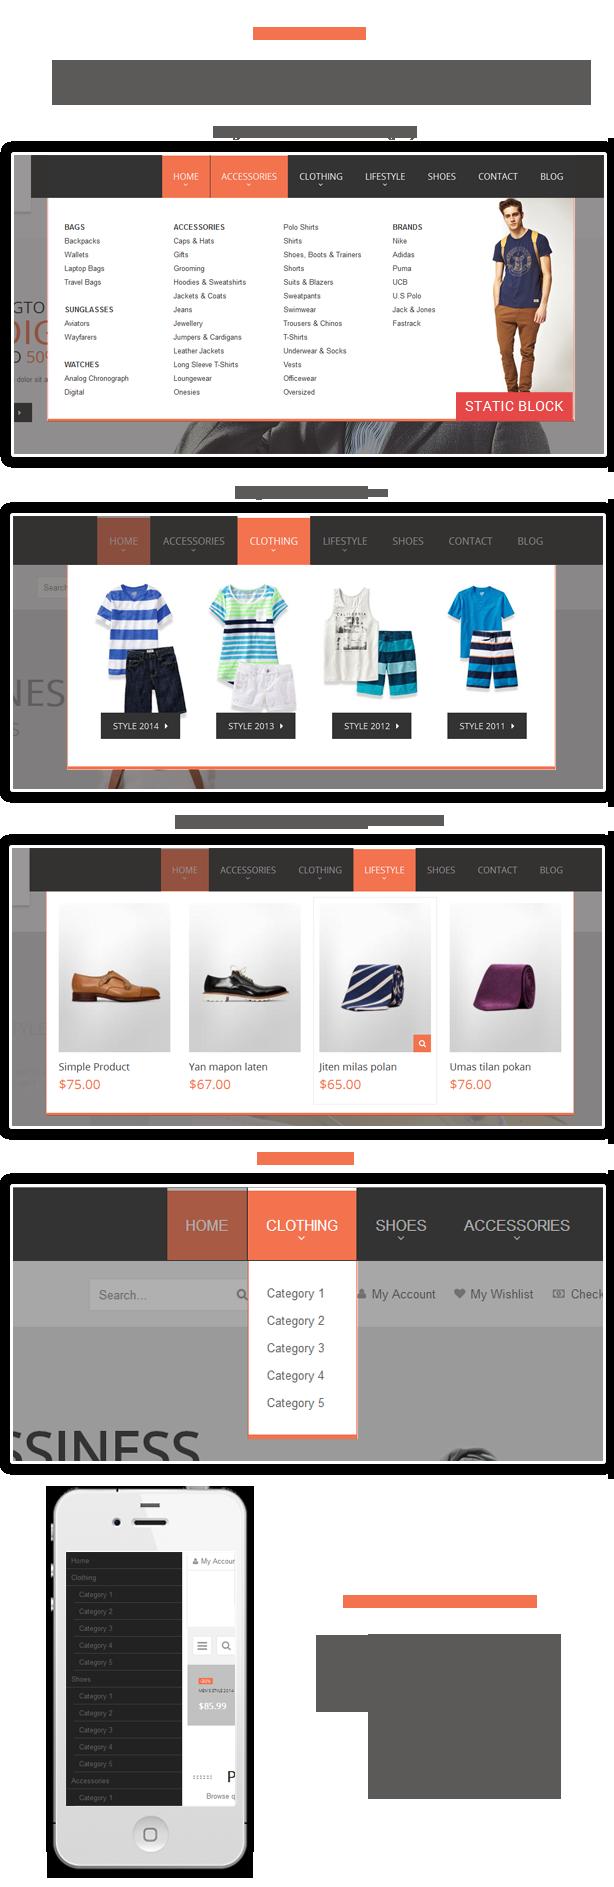 Nik- Menu styles